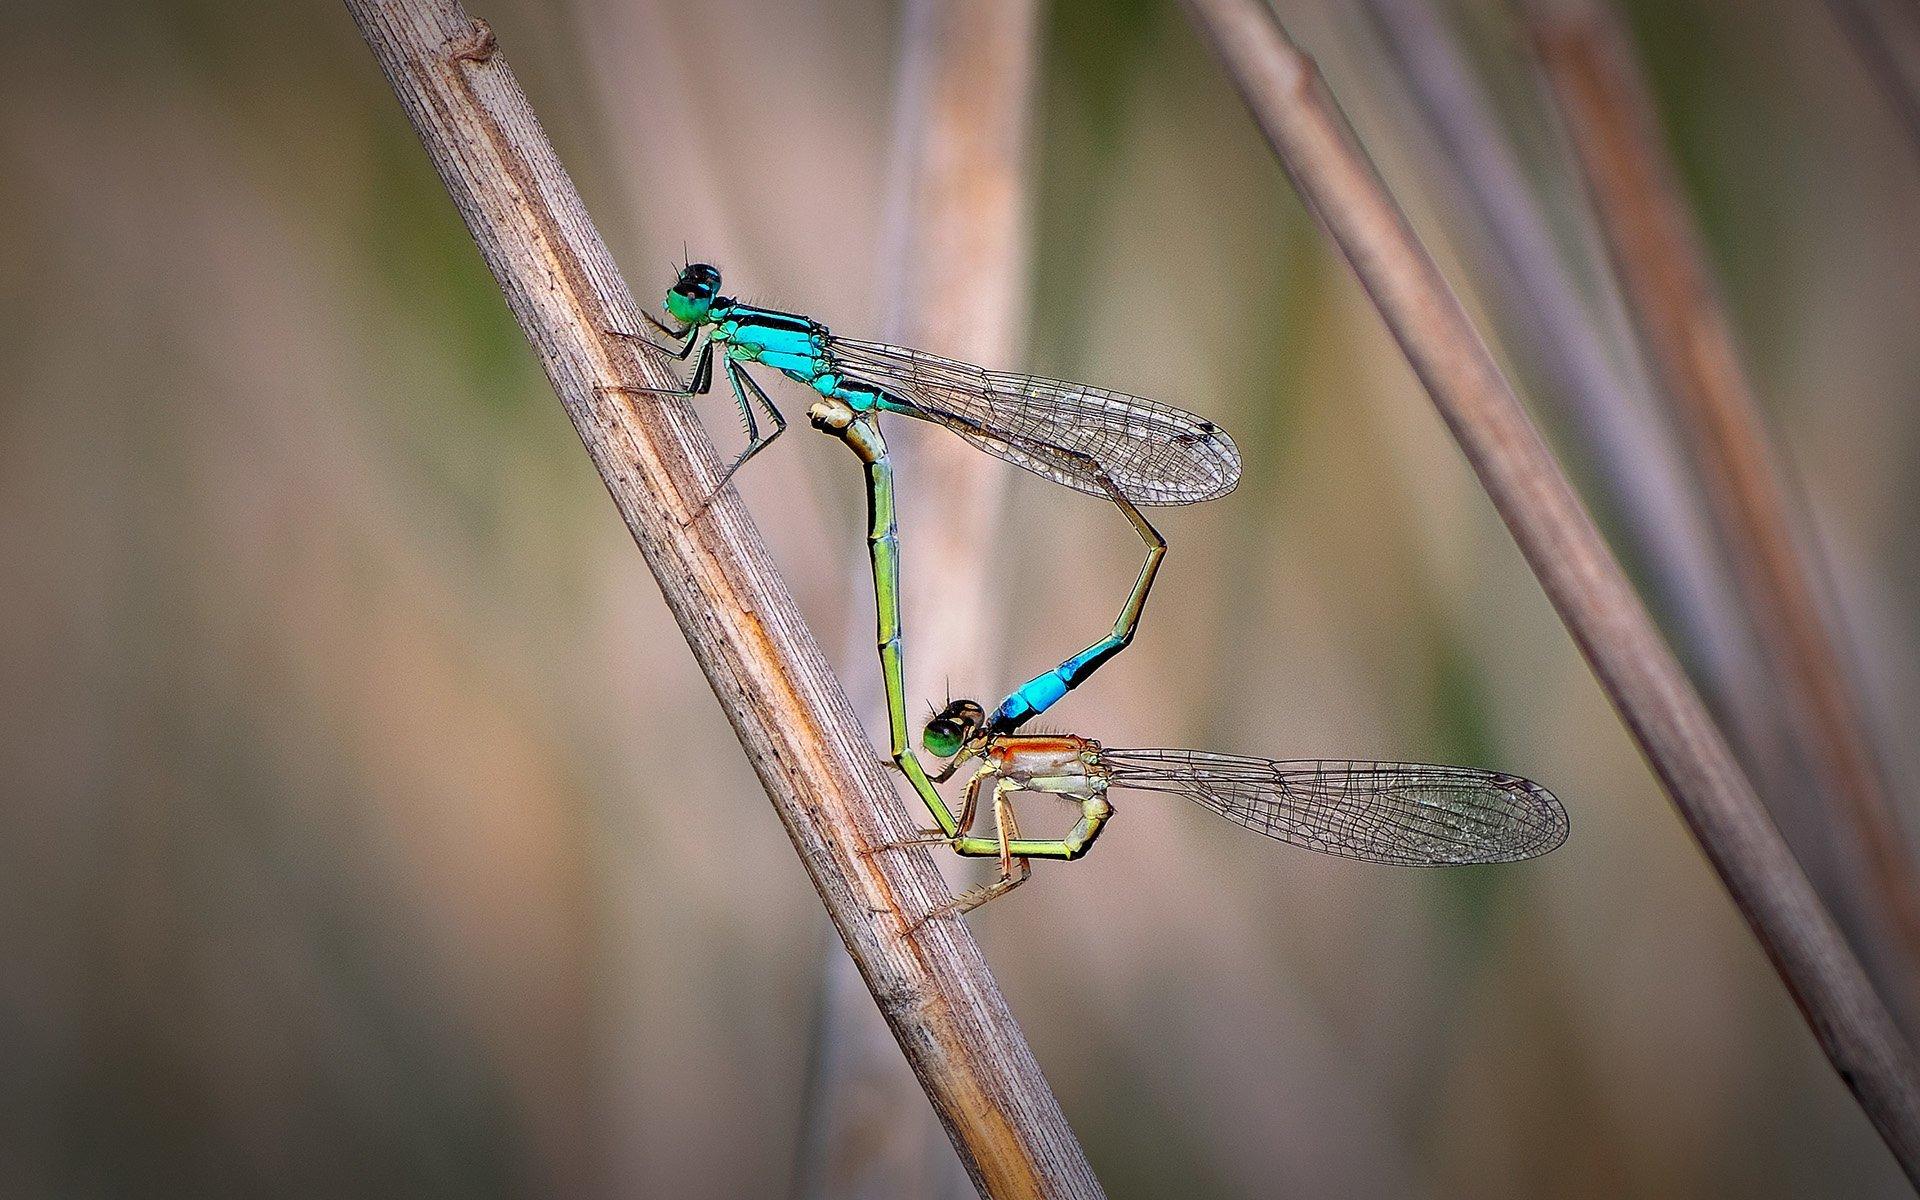 mavi kuyruklu iki yusufçuk